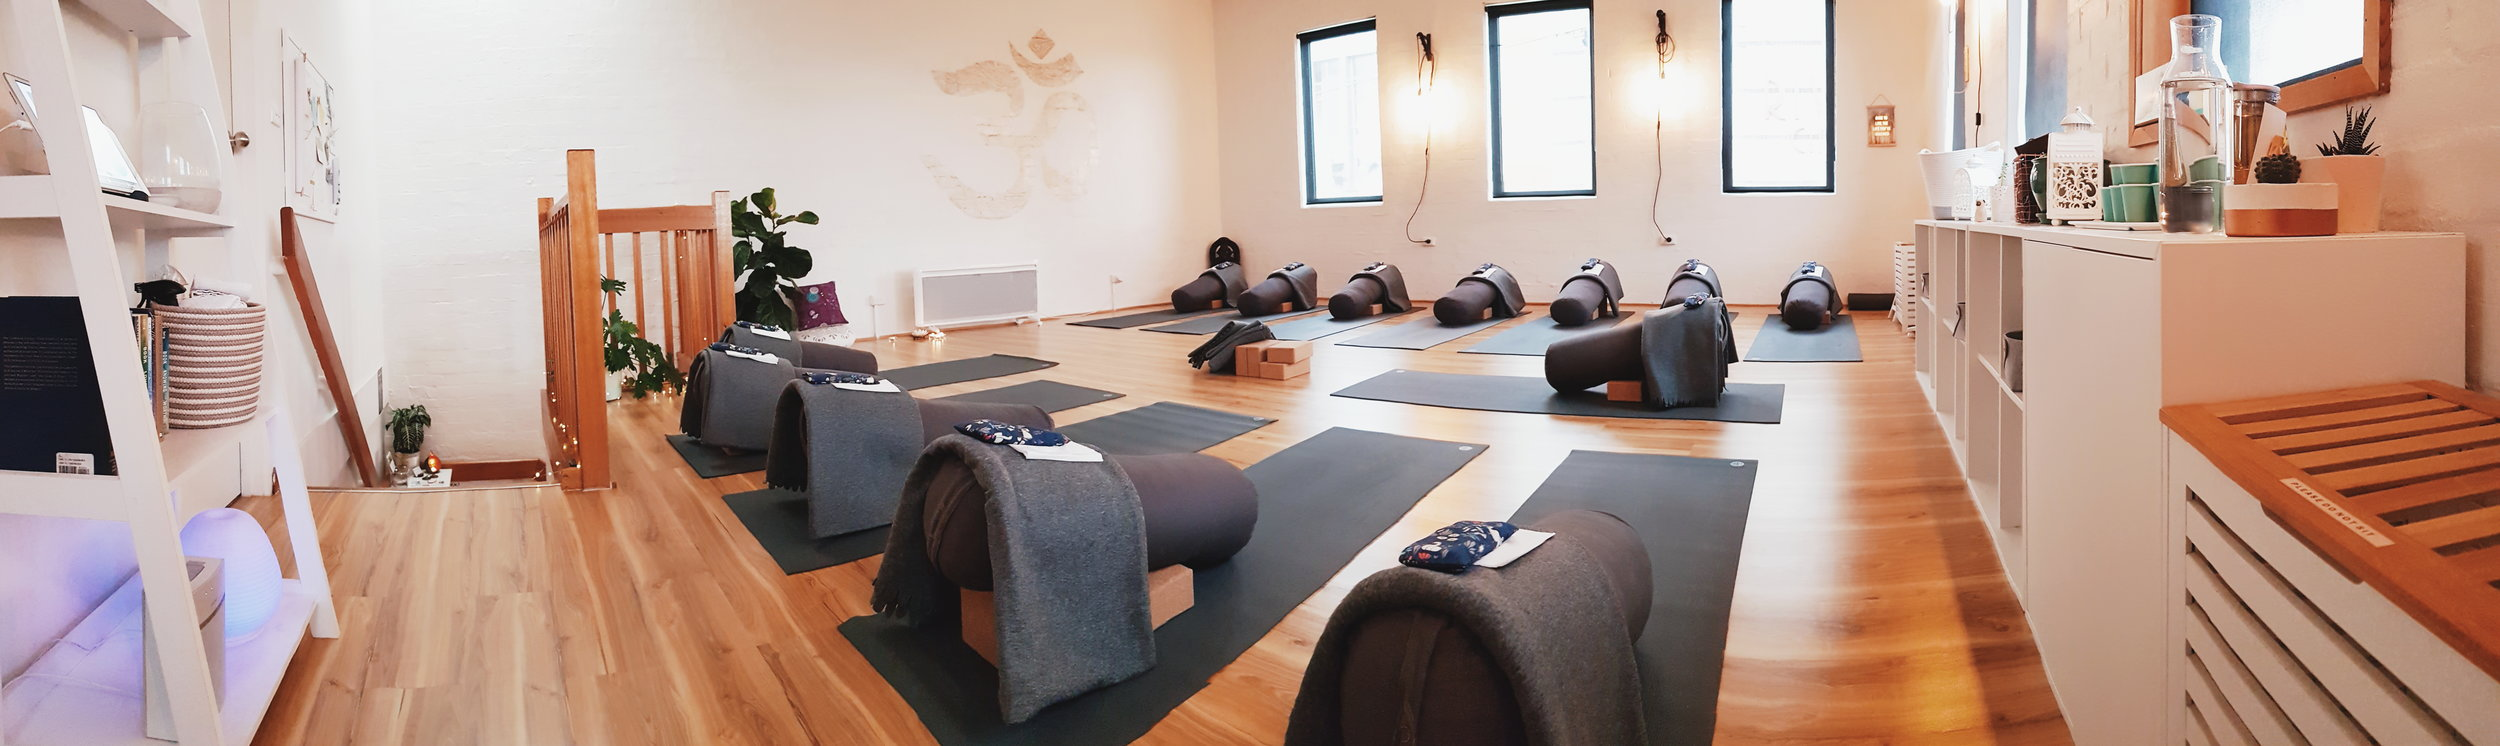 Jessica Dewar Yoga Studio Hawthorn East.jpg